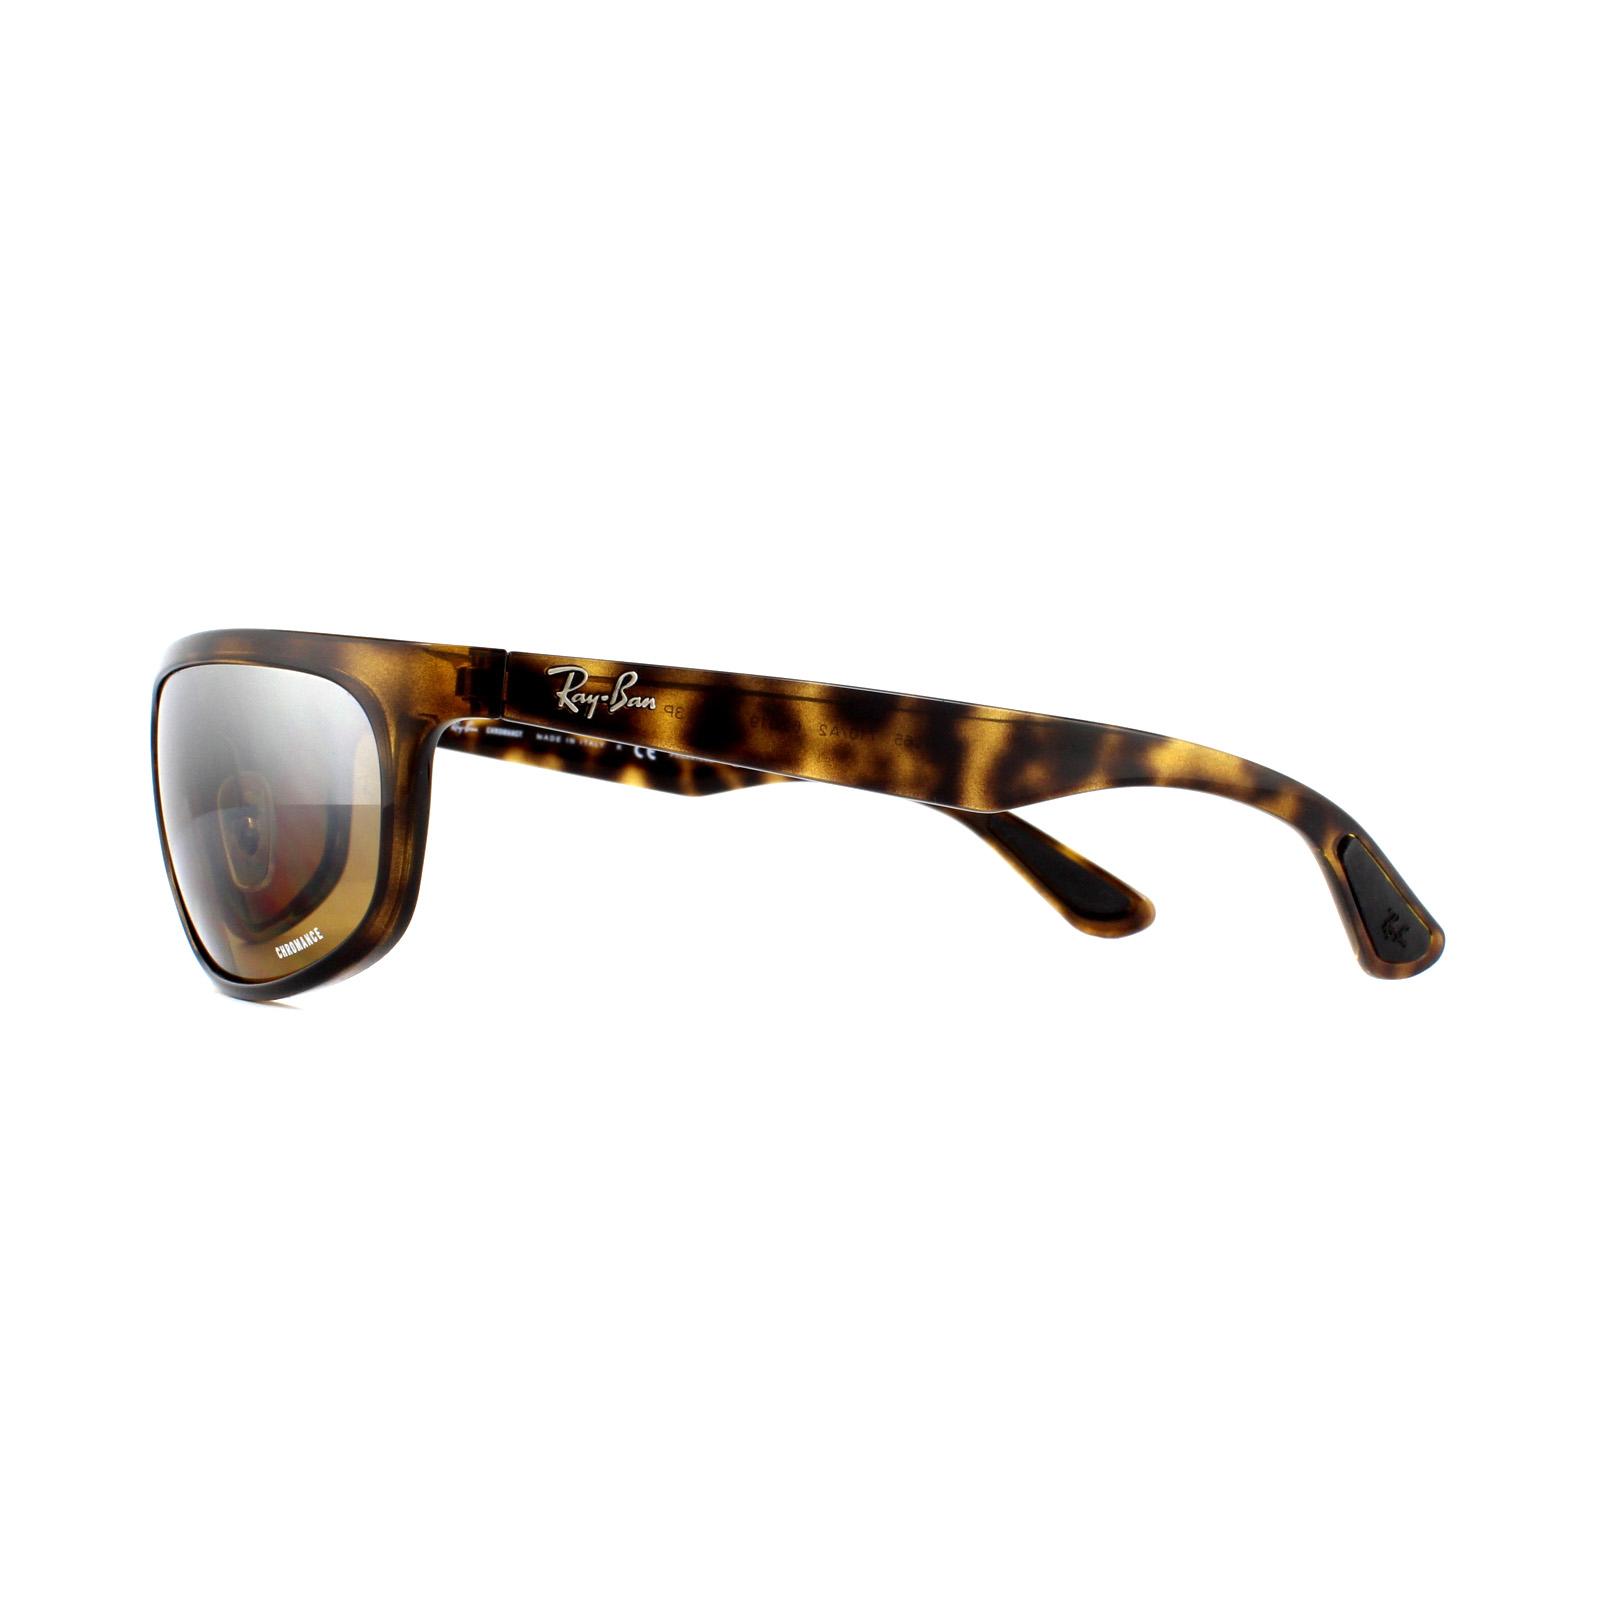 57004ecd40 ... Ray-Ban RB4265 Chromance Sunglasses Thumbnail 4 ...